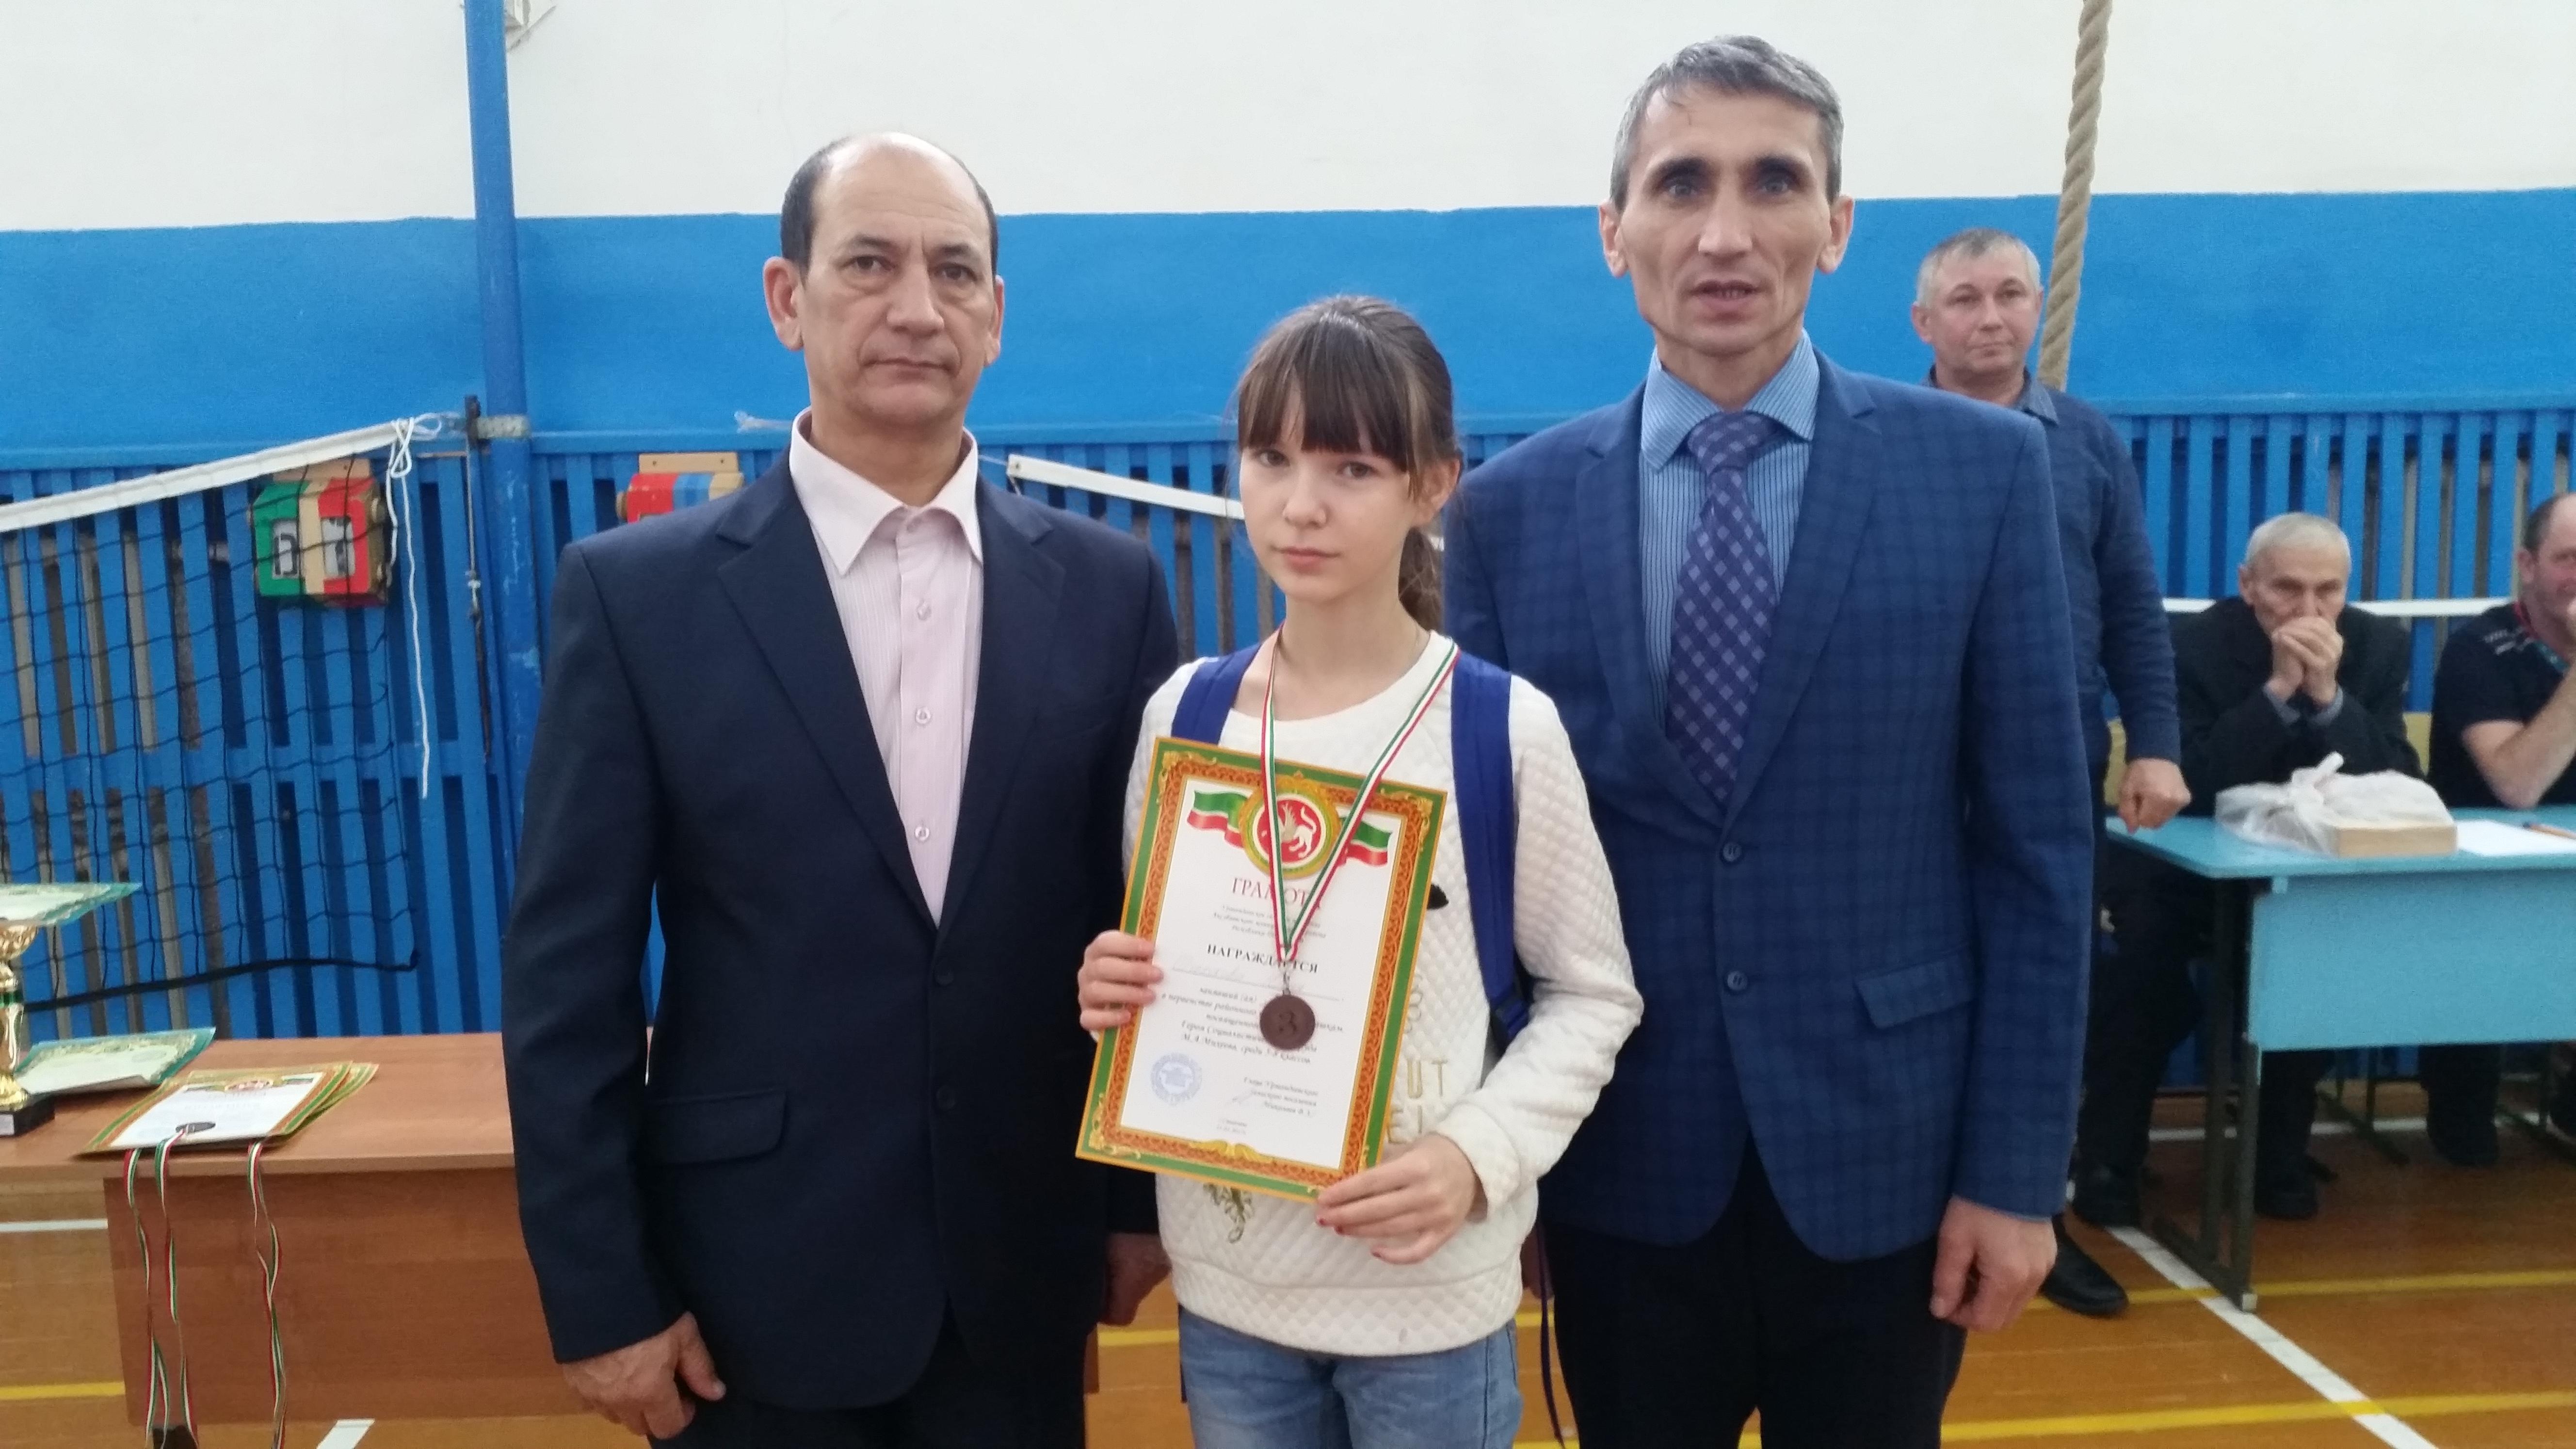 Турлукова Юлия - 3 место среди 5-8 классов